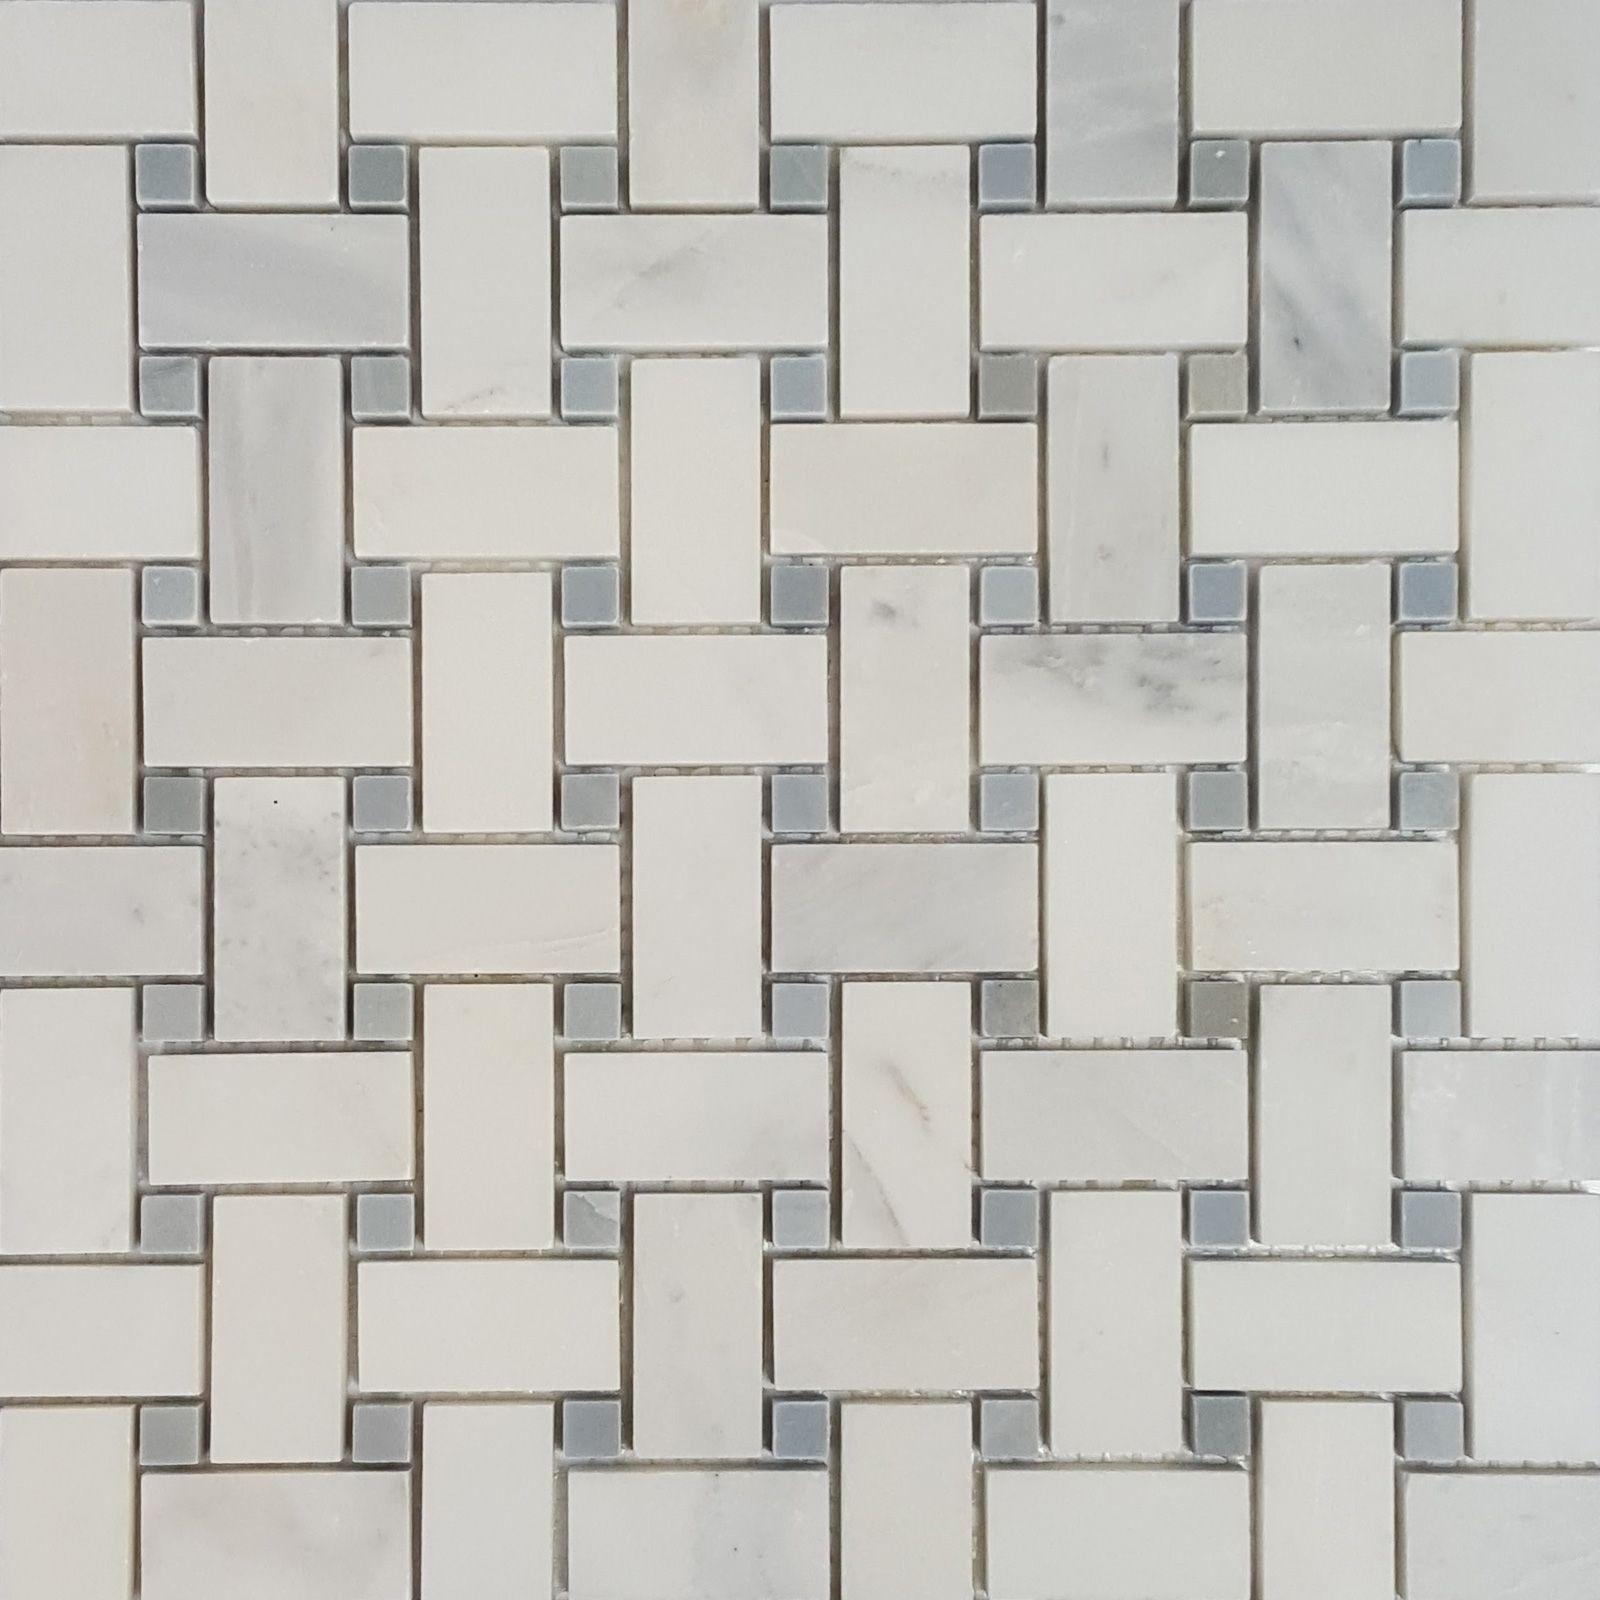 Basketweave mosaic tile asian carrara grey marble polished wall basketweave mosaic tile asian carrara grey marble polished wall floor tile kitchen backsplash bathroom wall floor doublecrazyfo Gallery